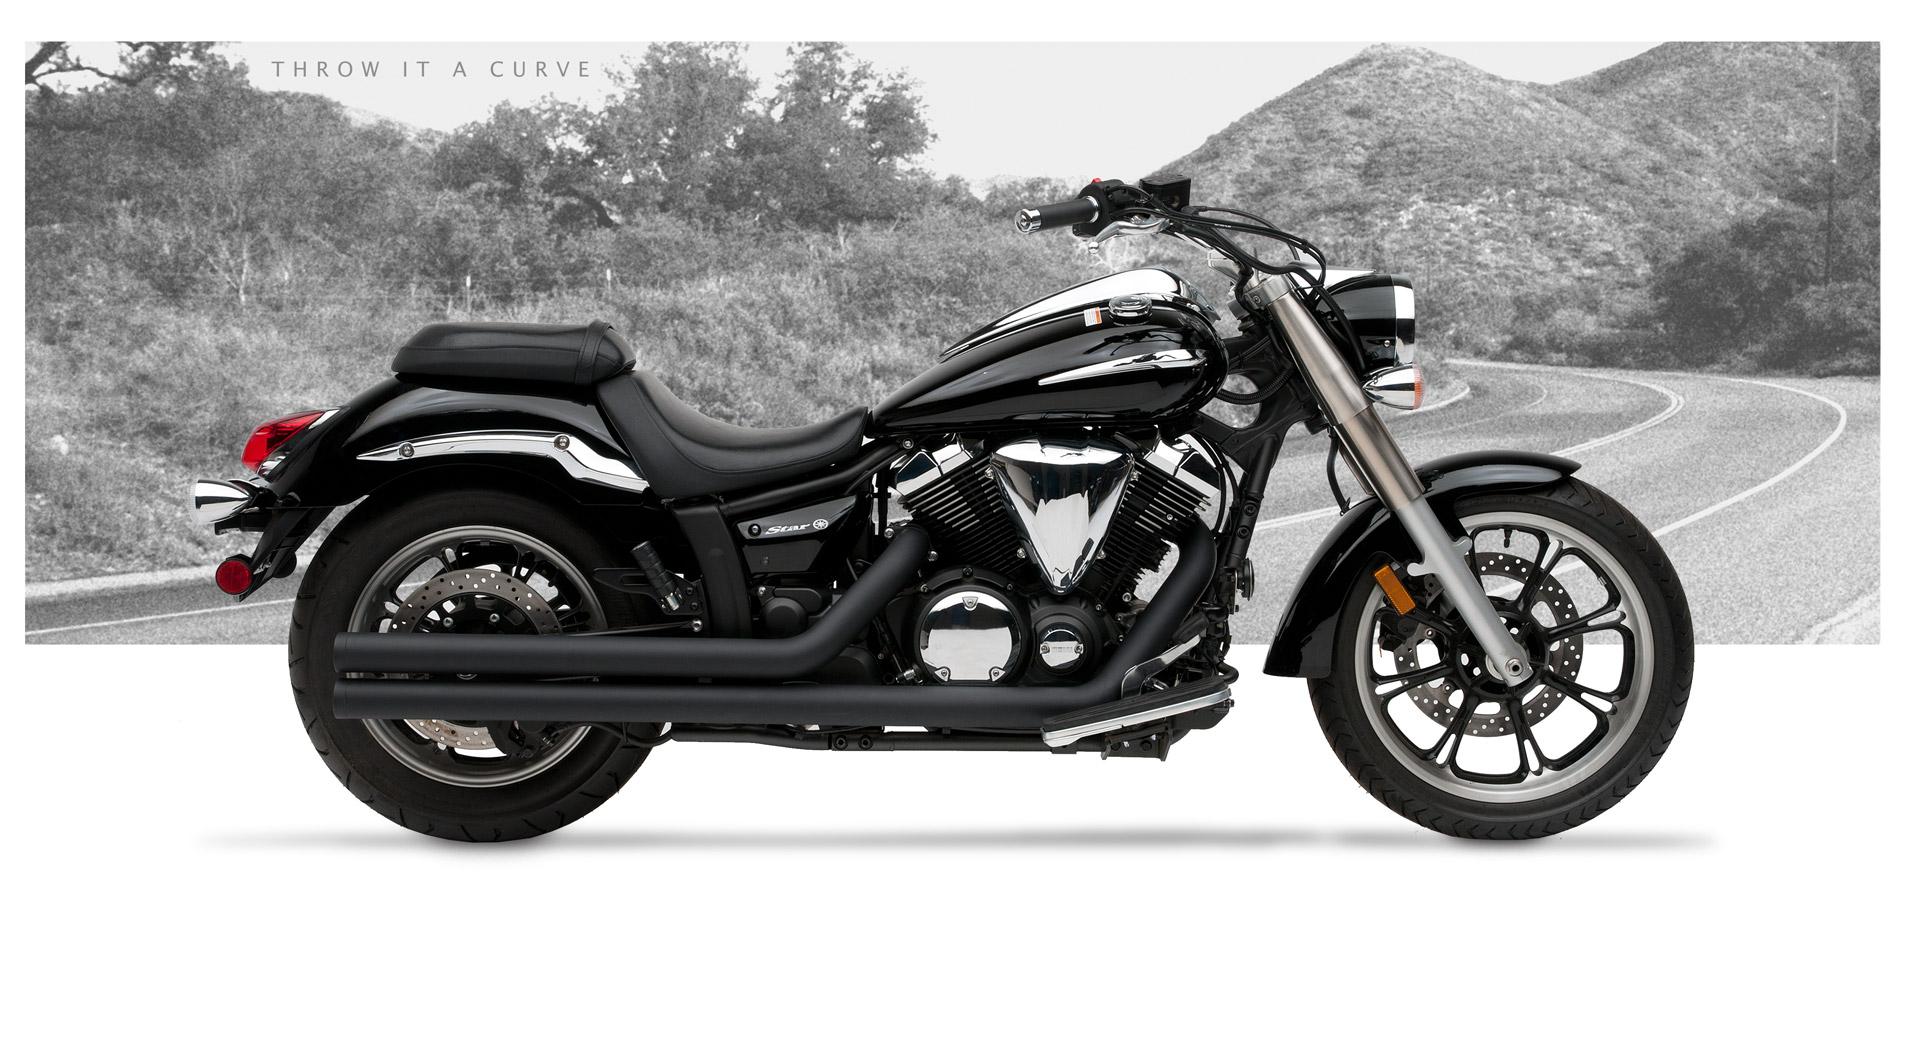 Yamaha V Star 950 2009-12 Motorcycle Exhaust | Hard-Krome